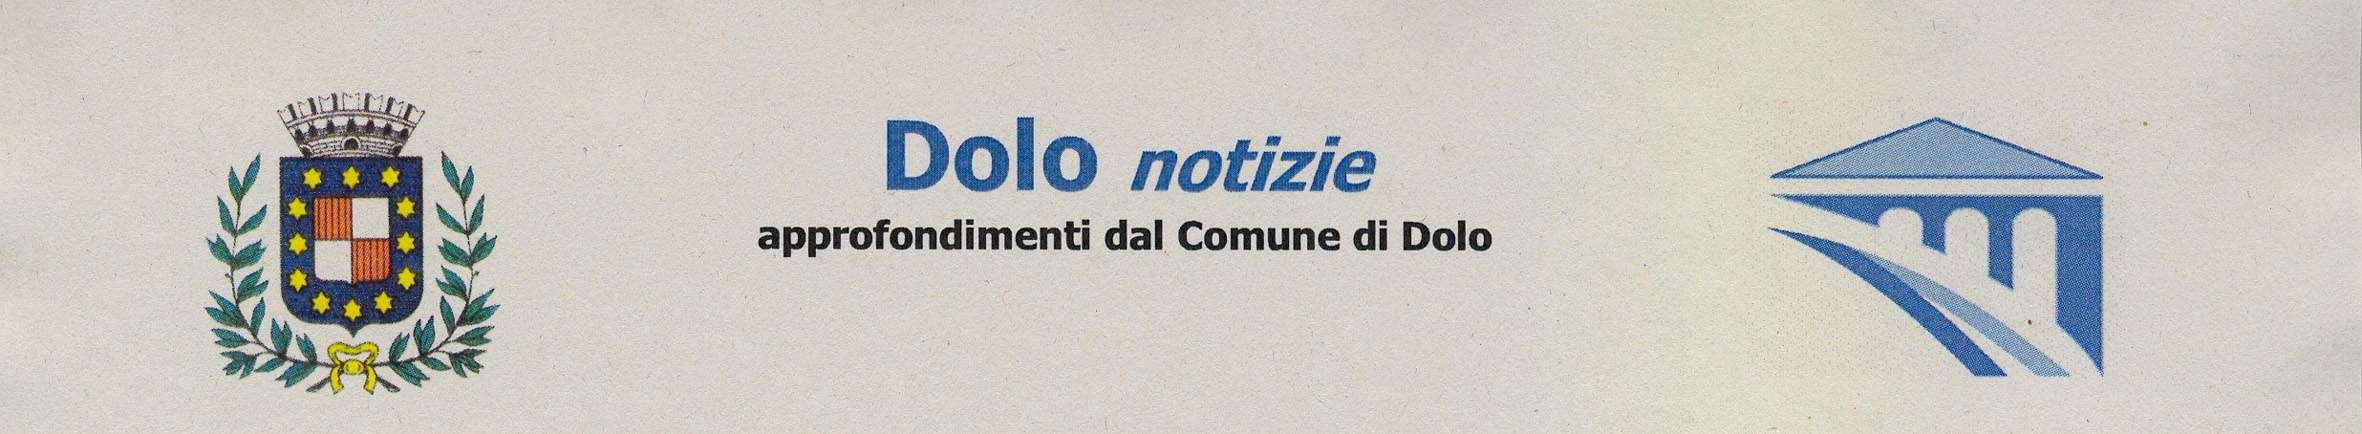 DoloNotizie_intestazione.jpg